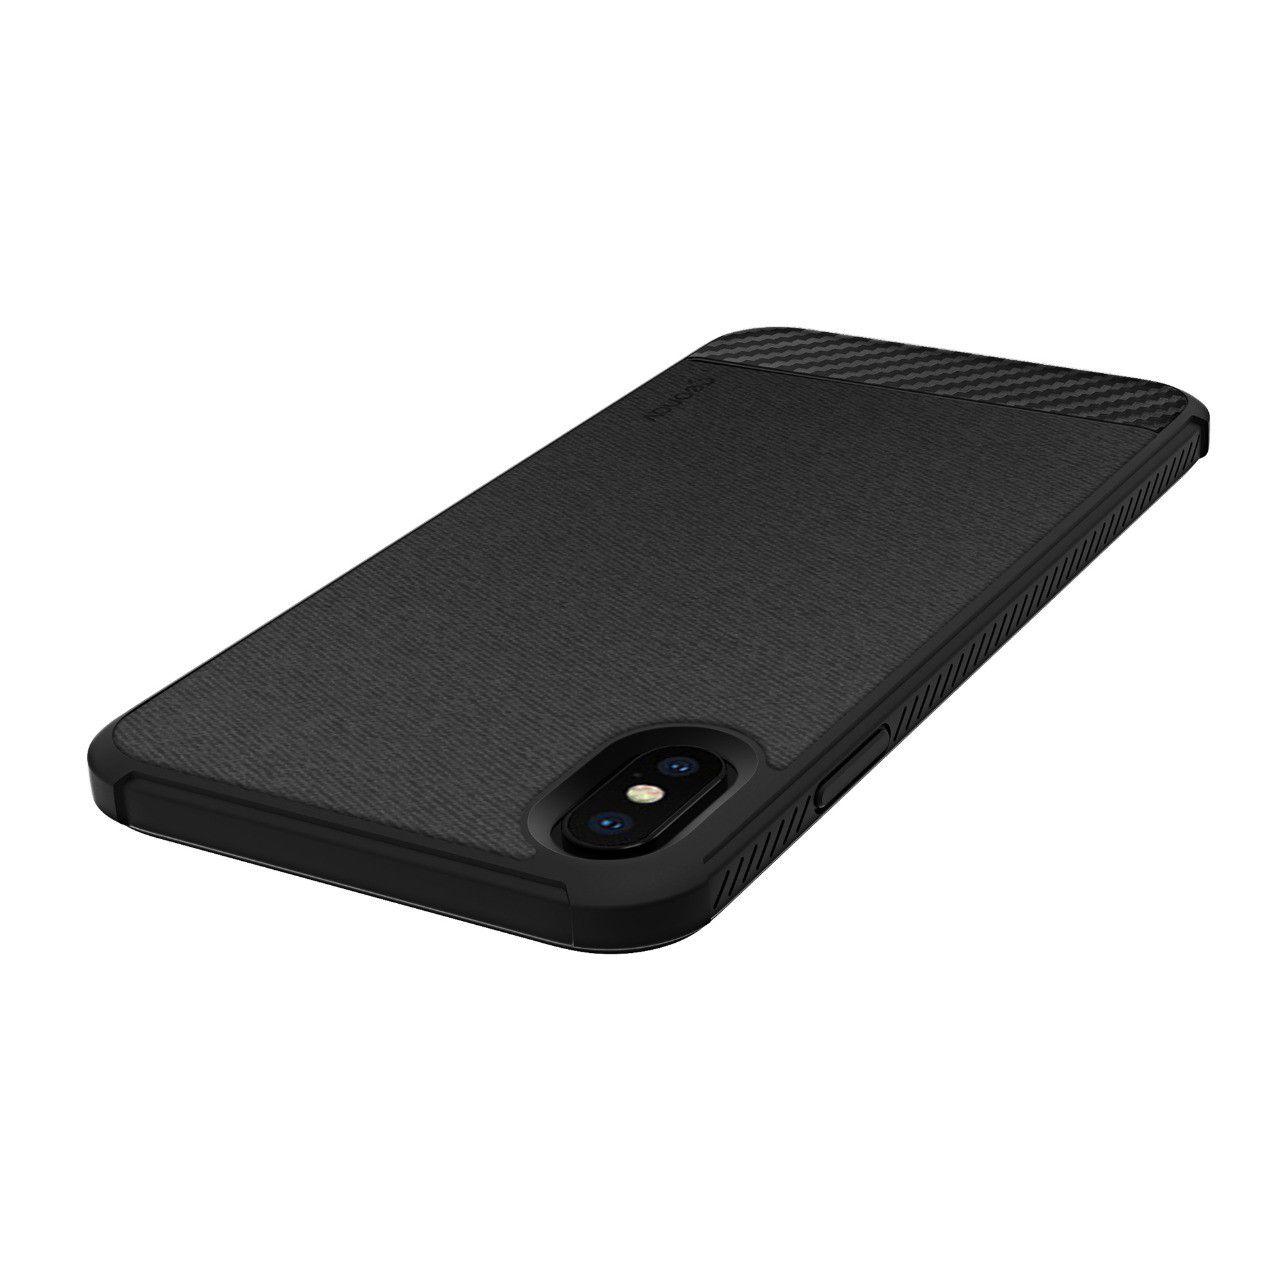 Capa Carbon X Compatível com iPhone XS MAX Black - IPSXMB - Geonav